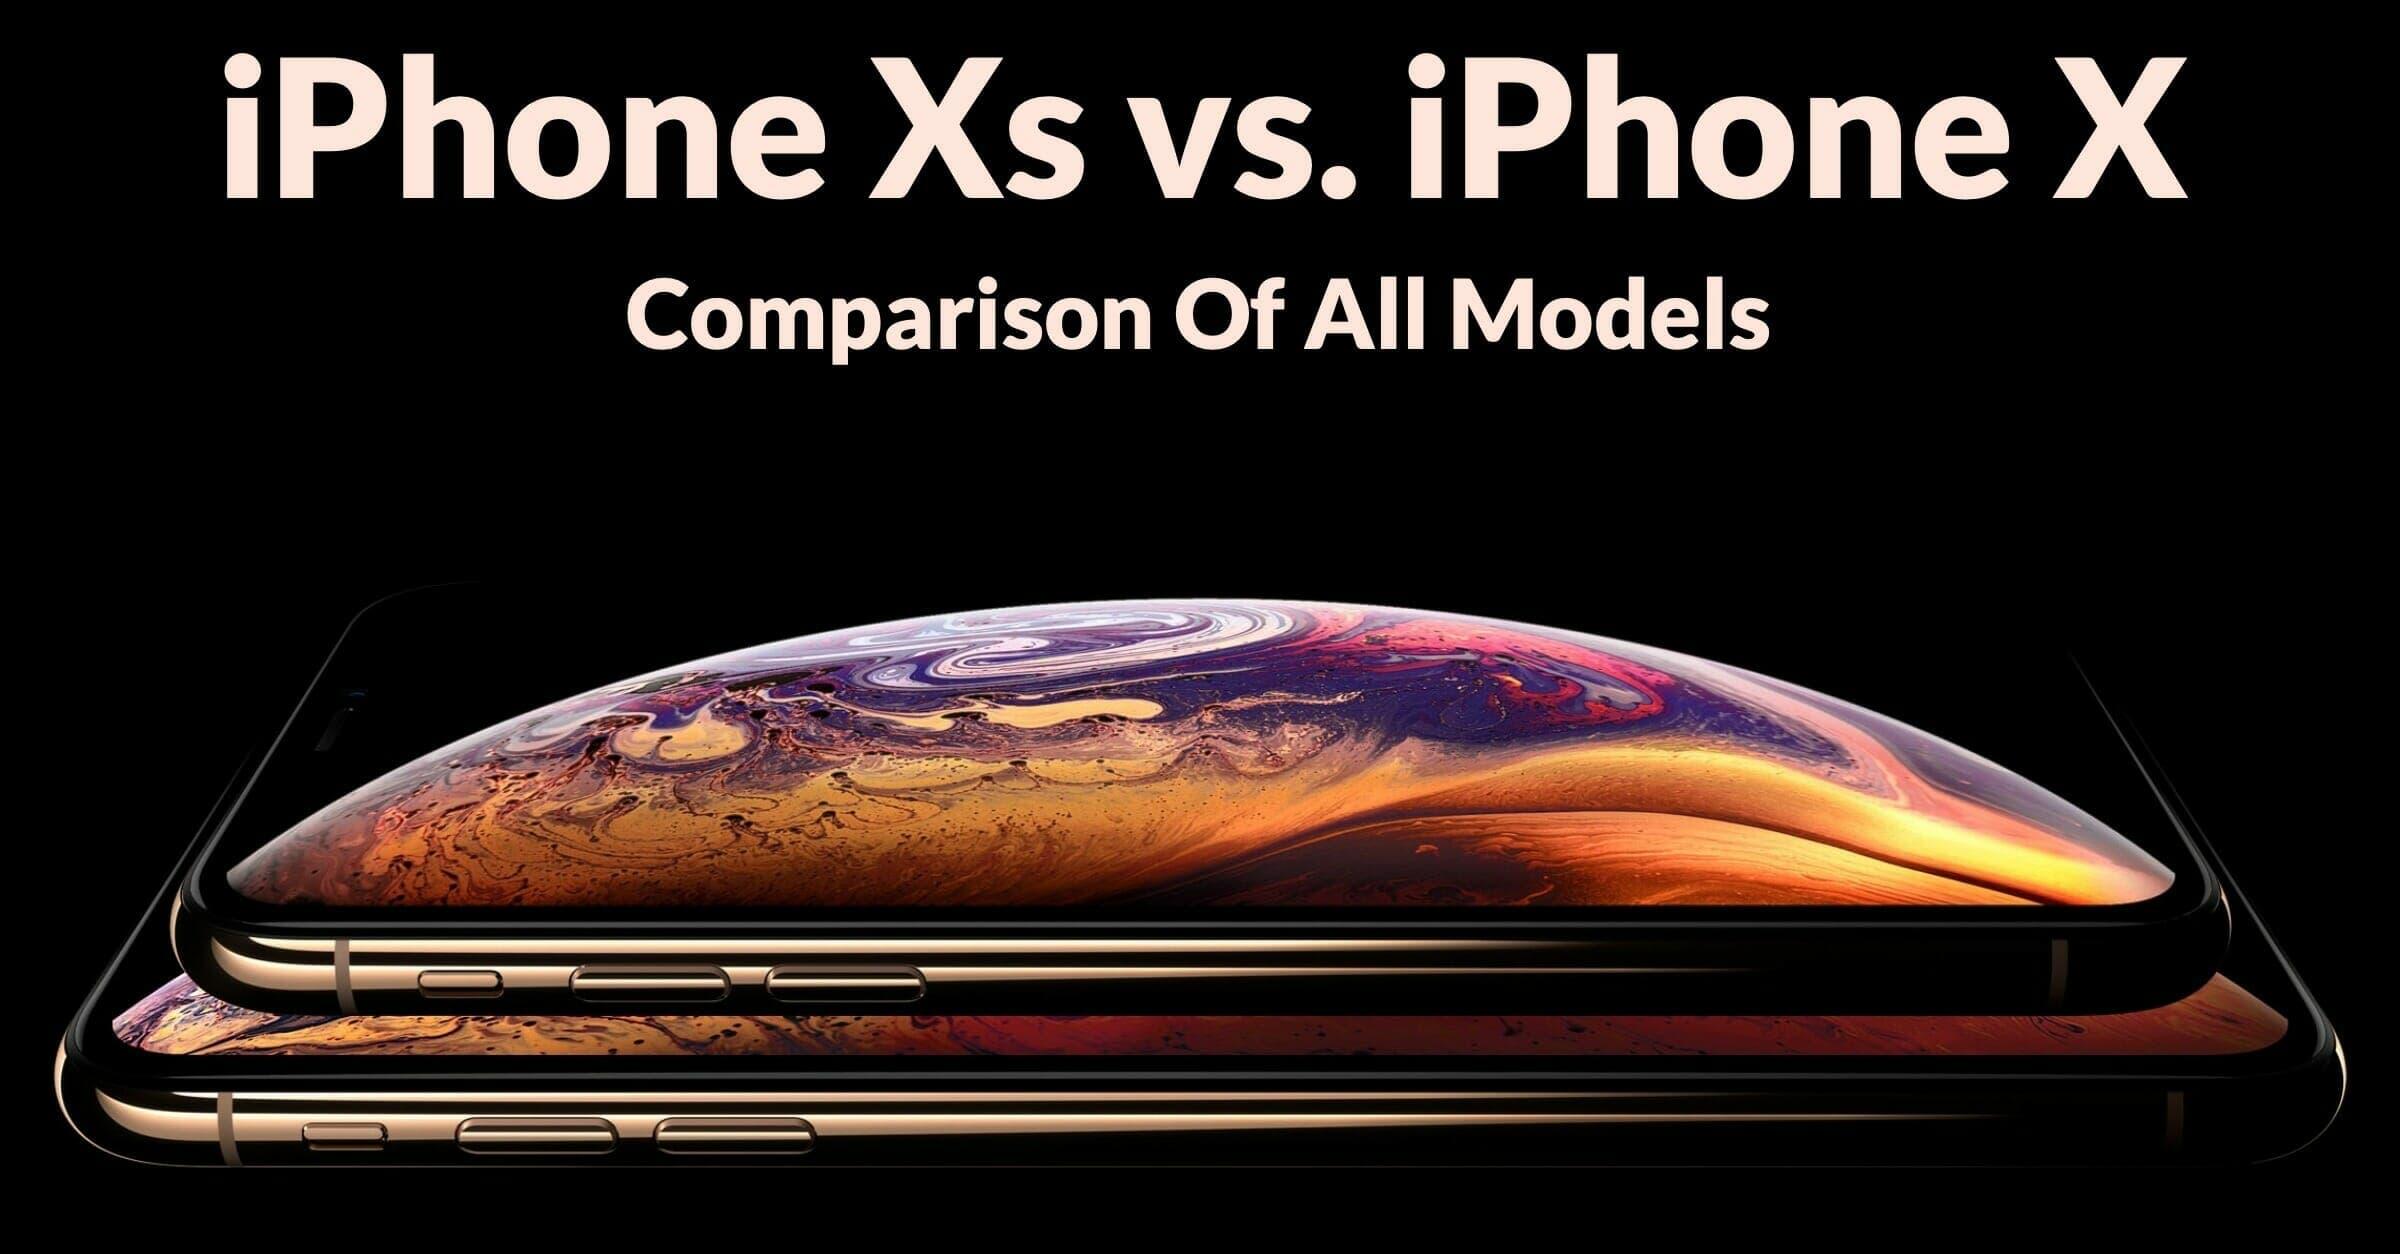 iPhone Xs vs. iPhone X